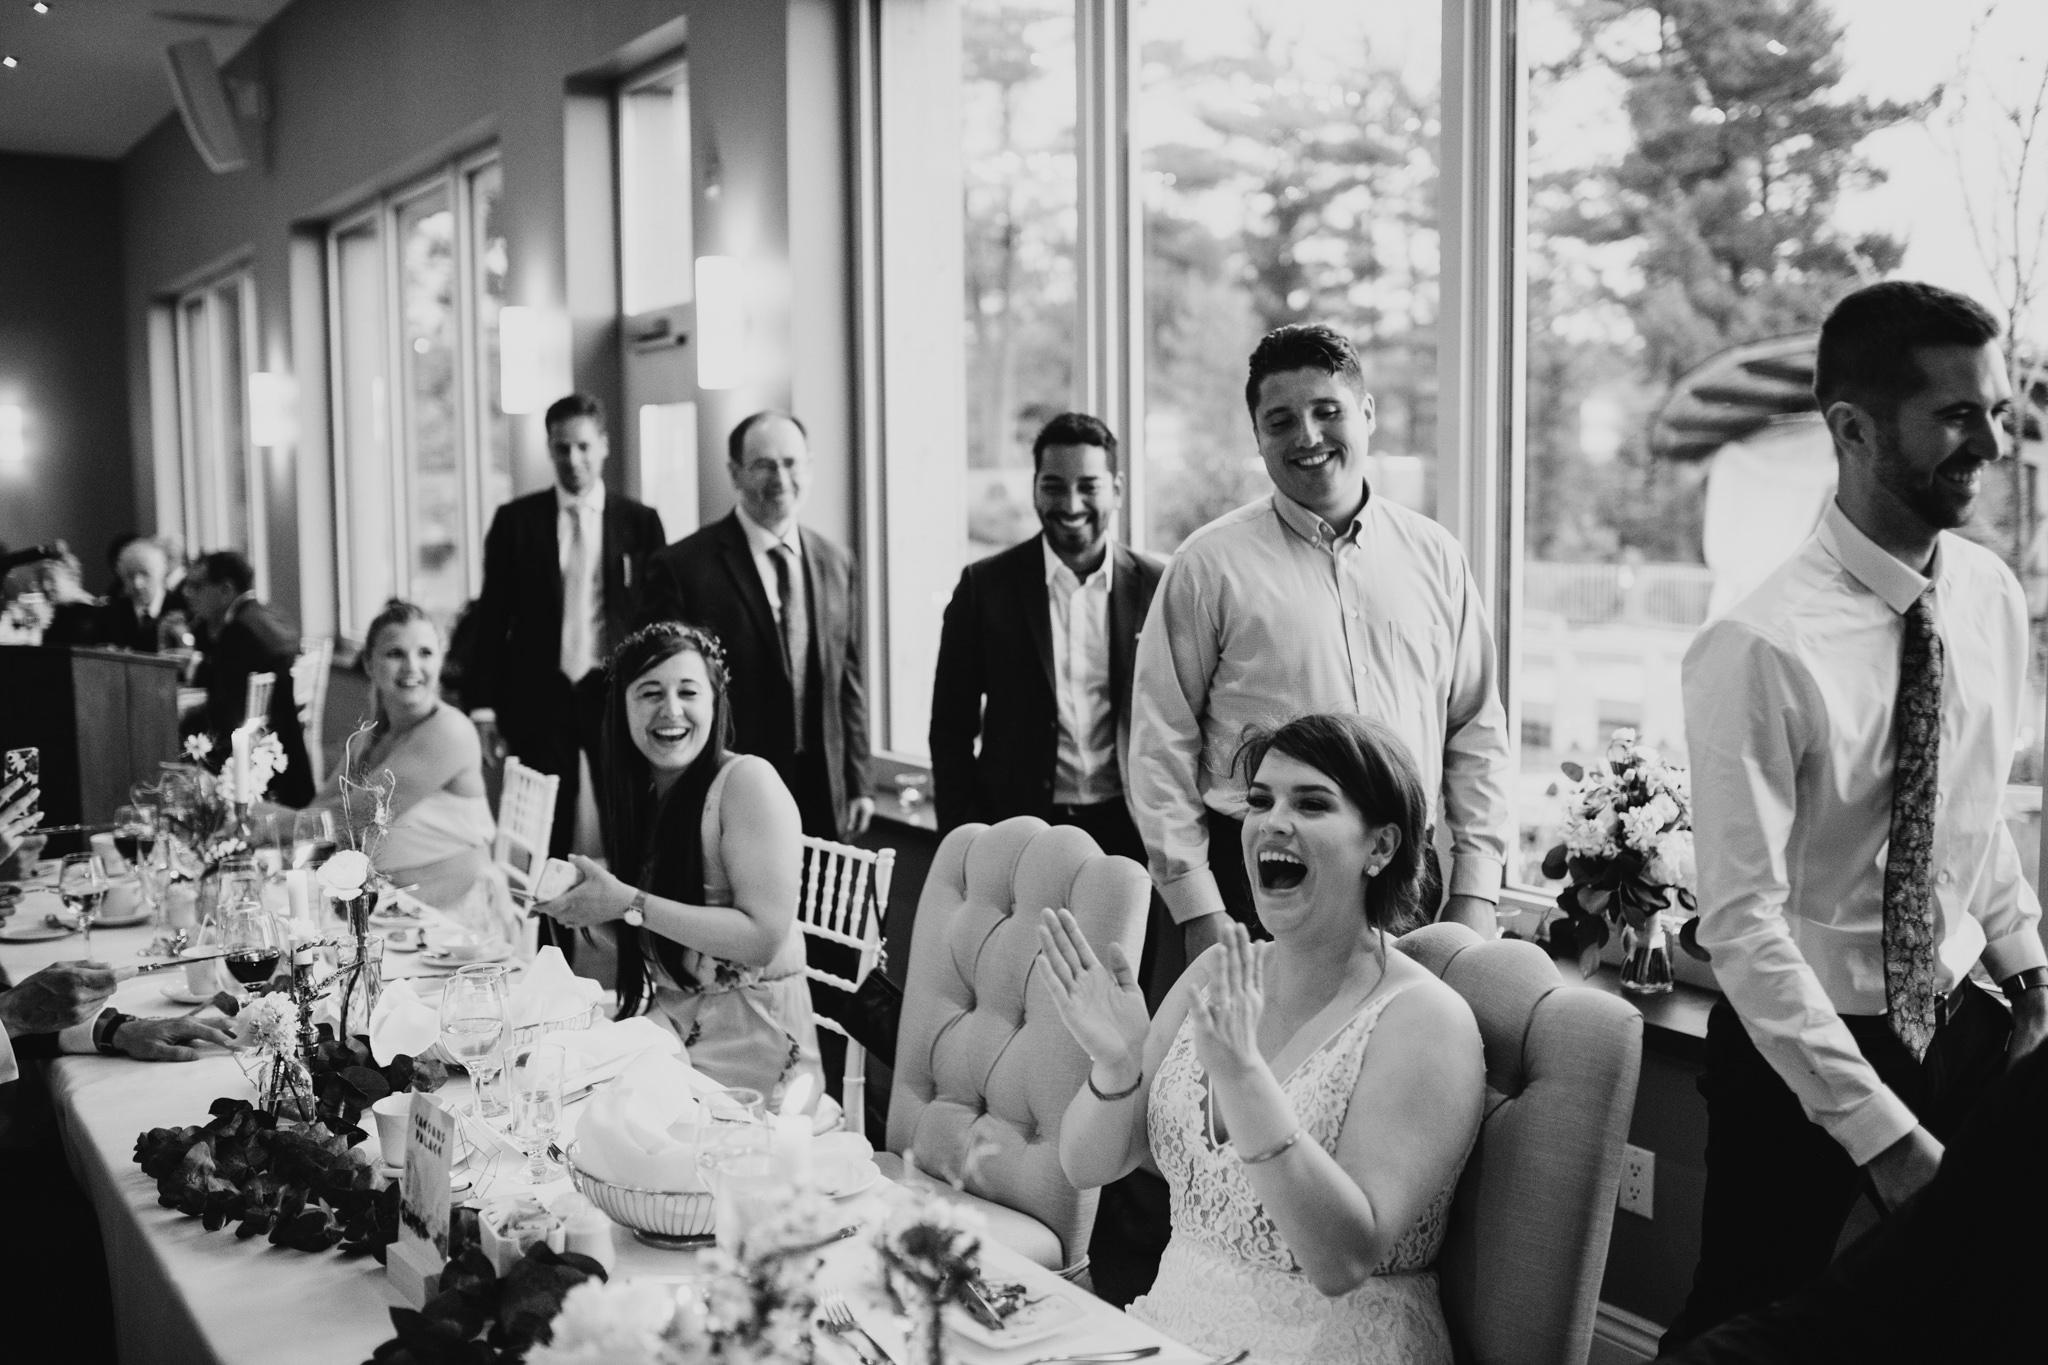 Swedish Kissing Wedding Tradition